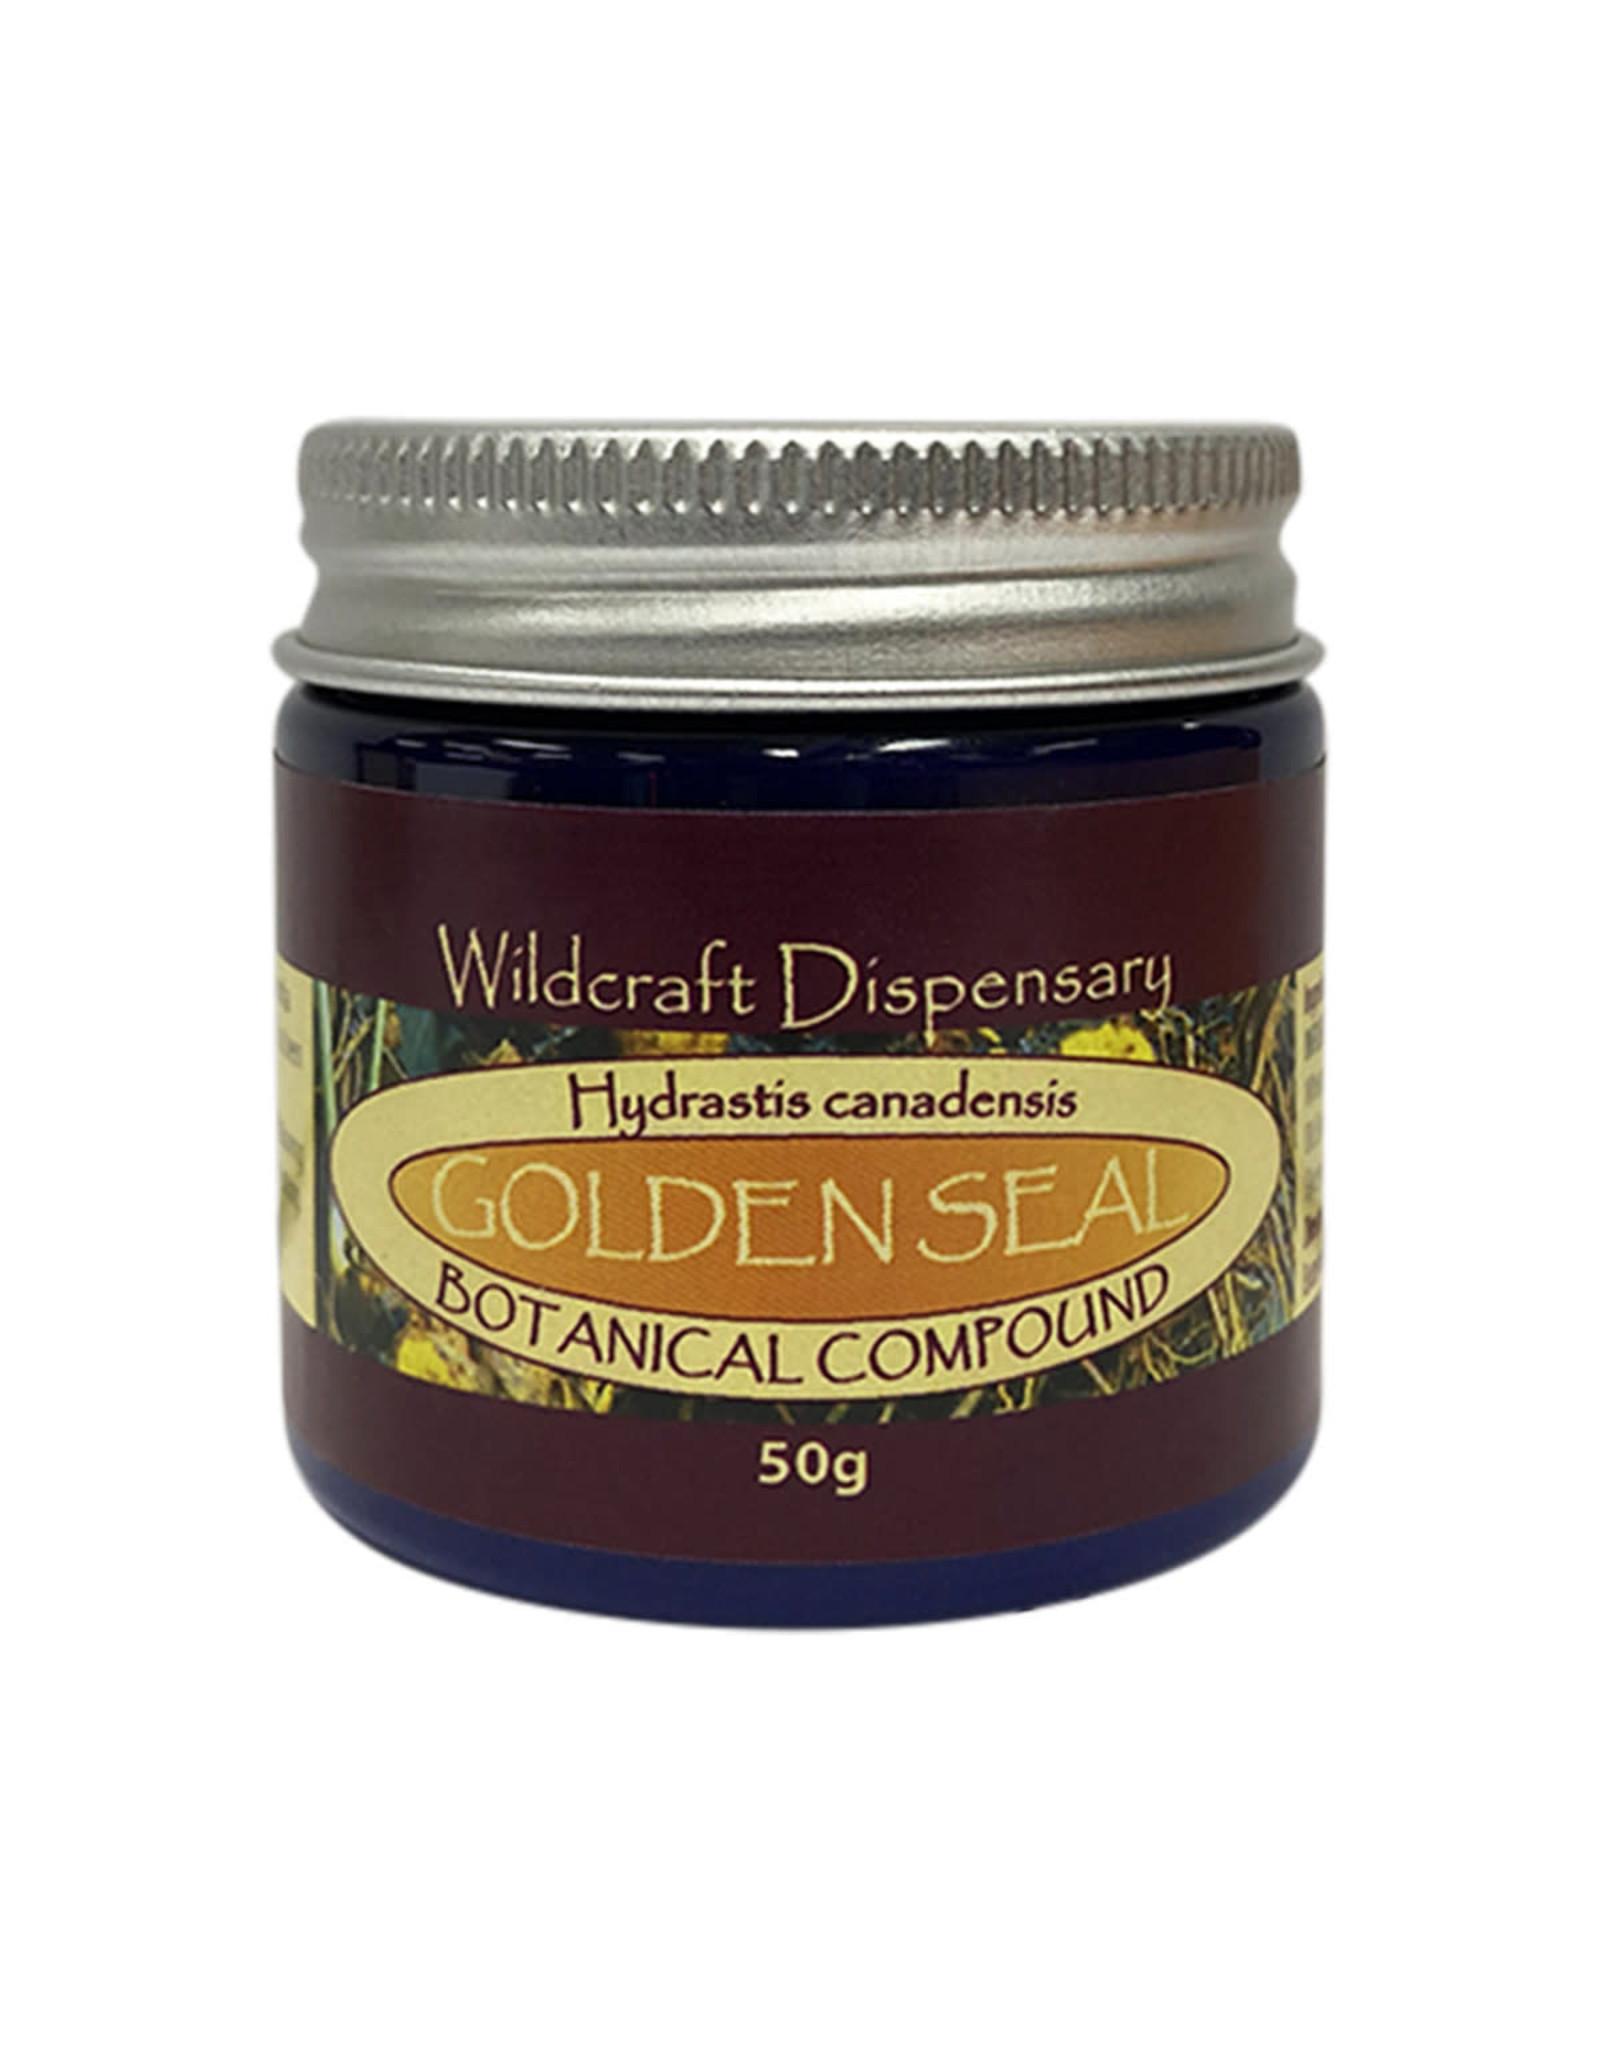 Wildcraft Dispensary Golden Seal Natural Ointment 50g